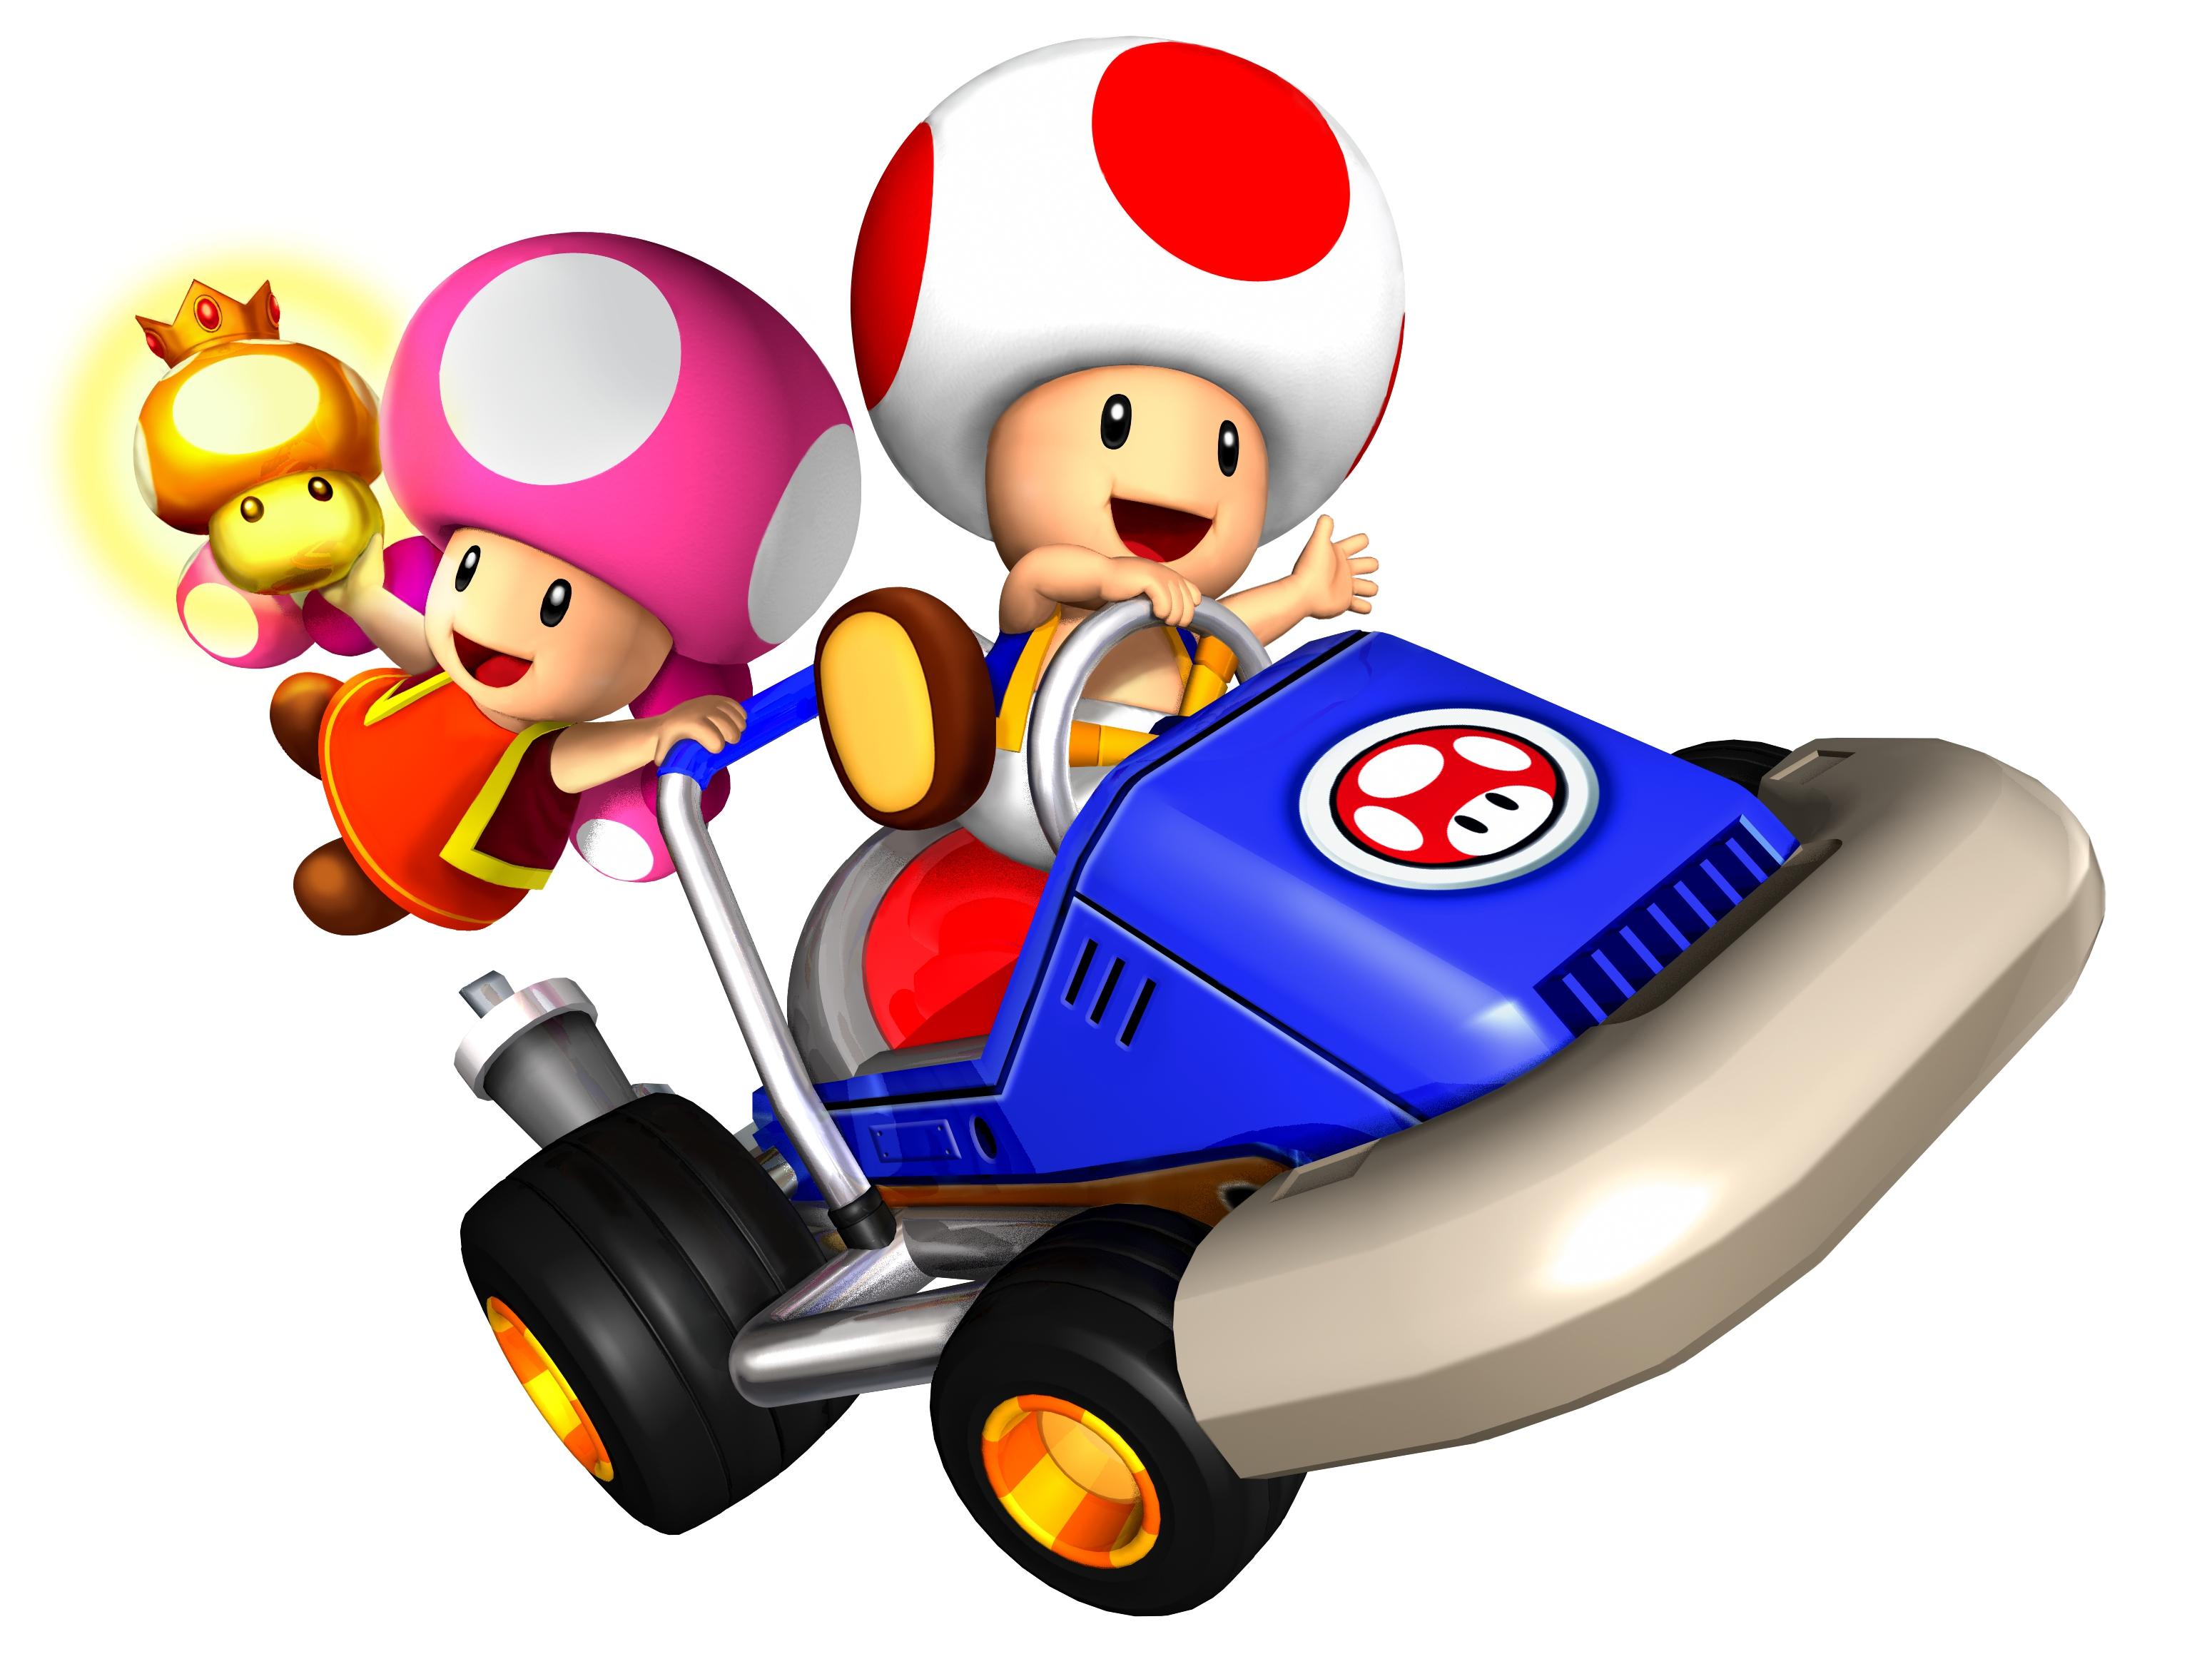 Coloriage Toad Mario Kart A Imprimer